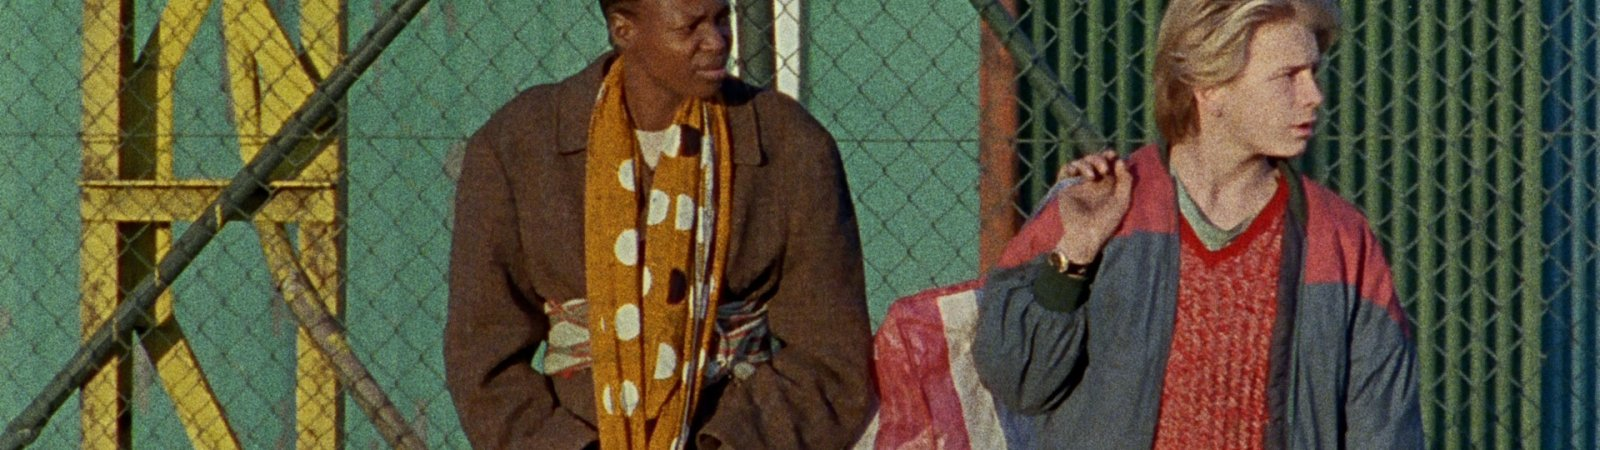 Photo du film : La promesse